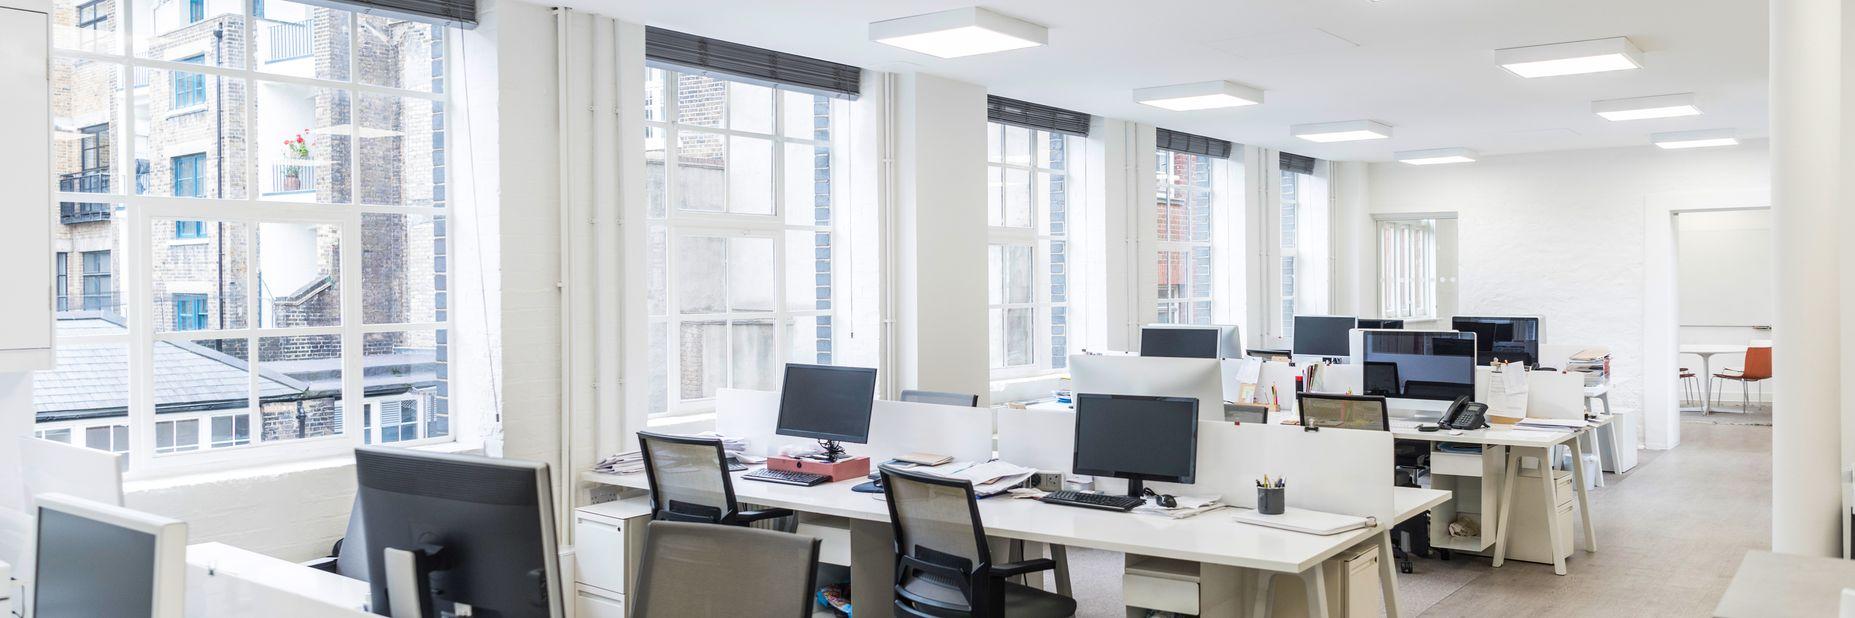 Interior shot of Swiss office